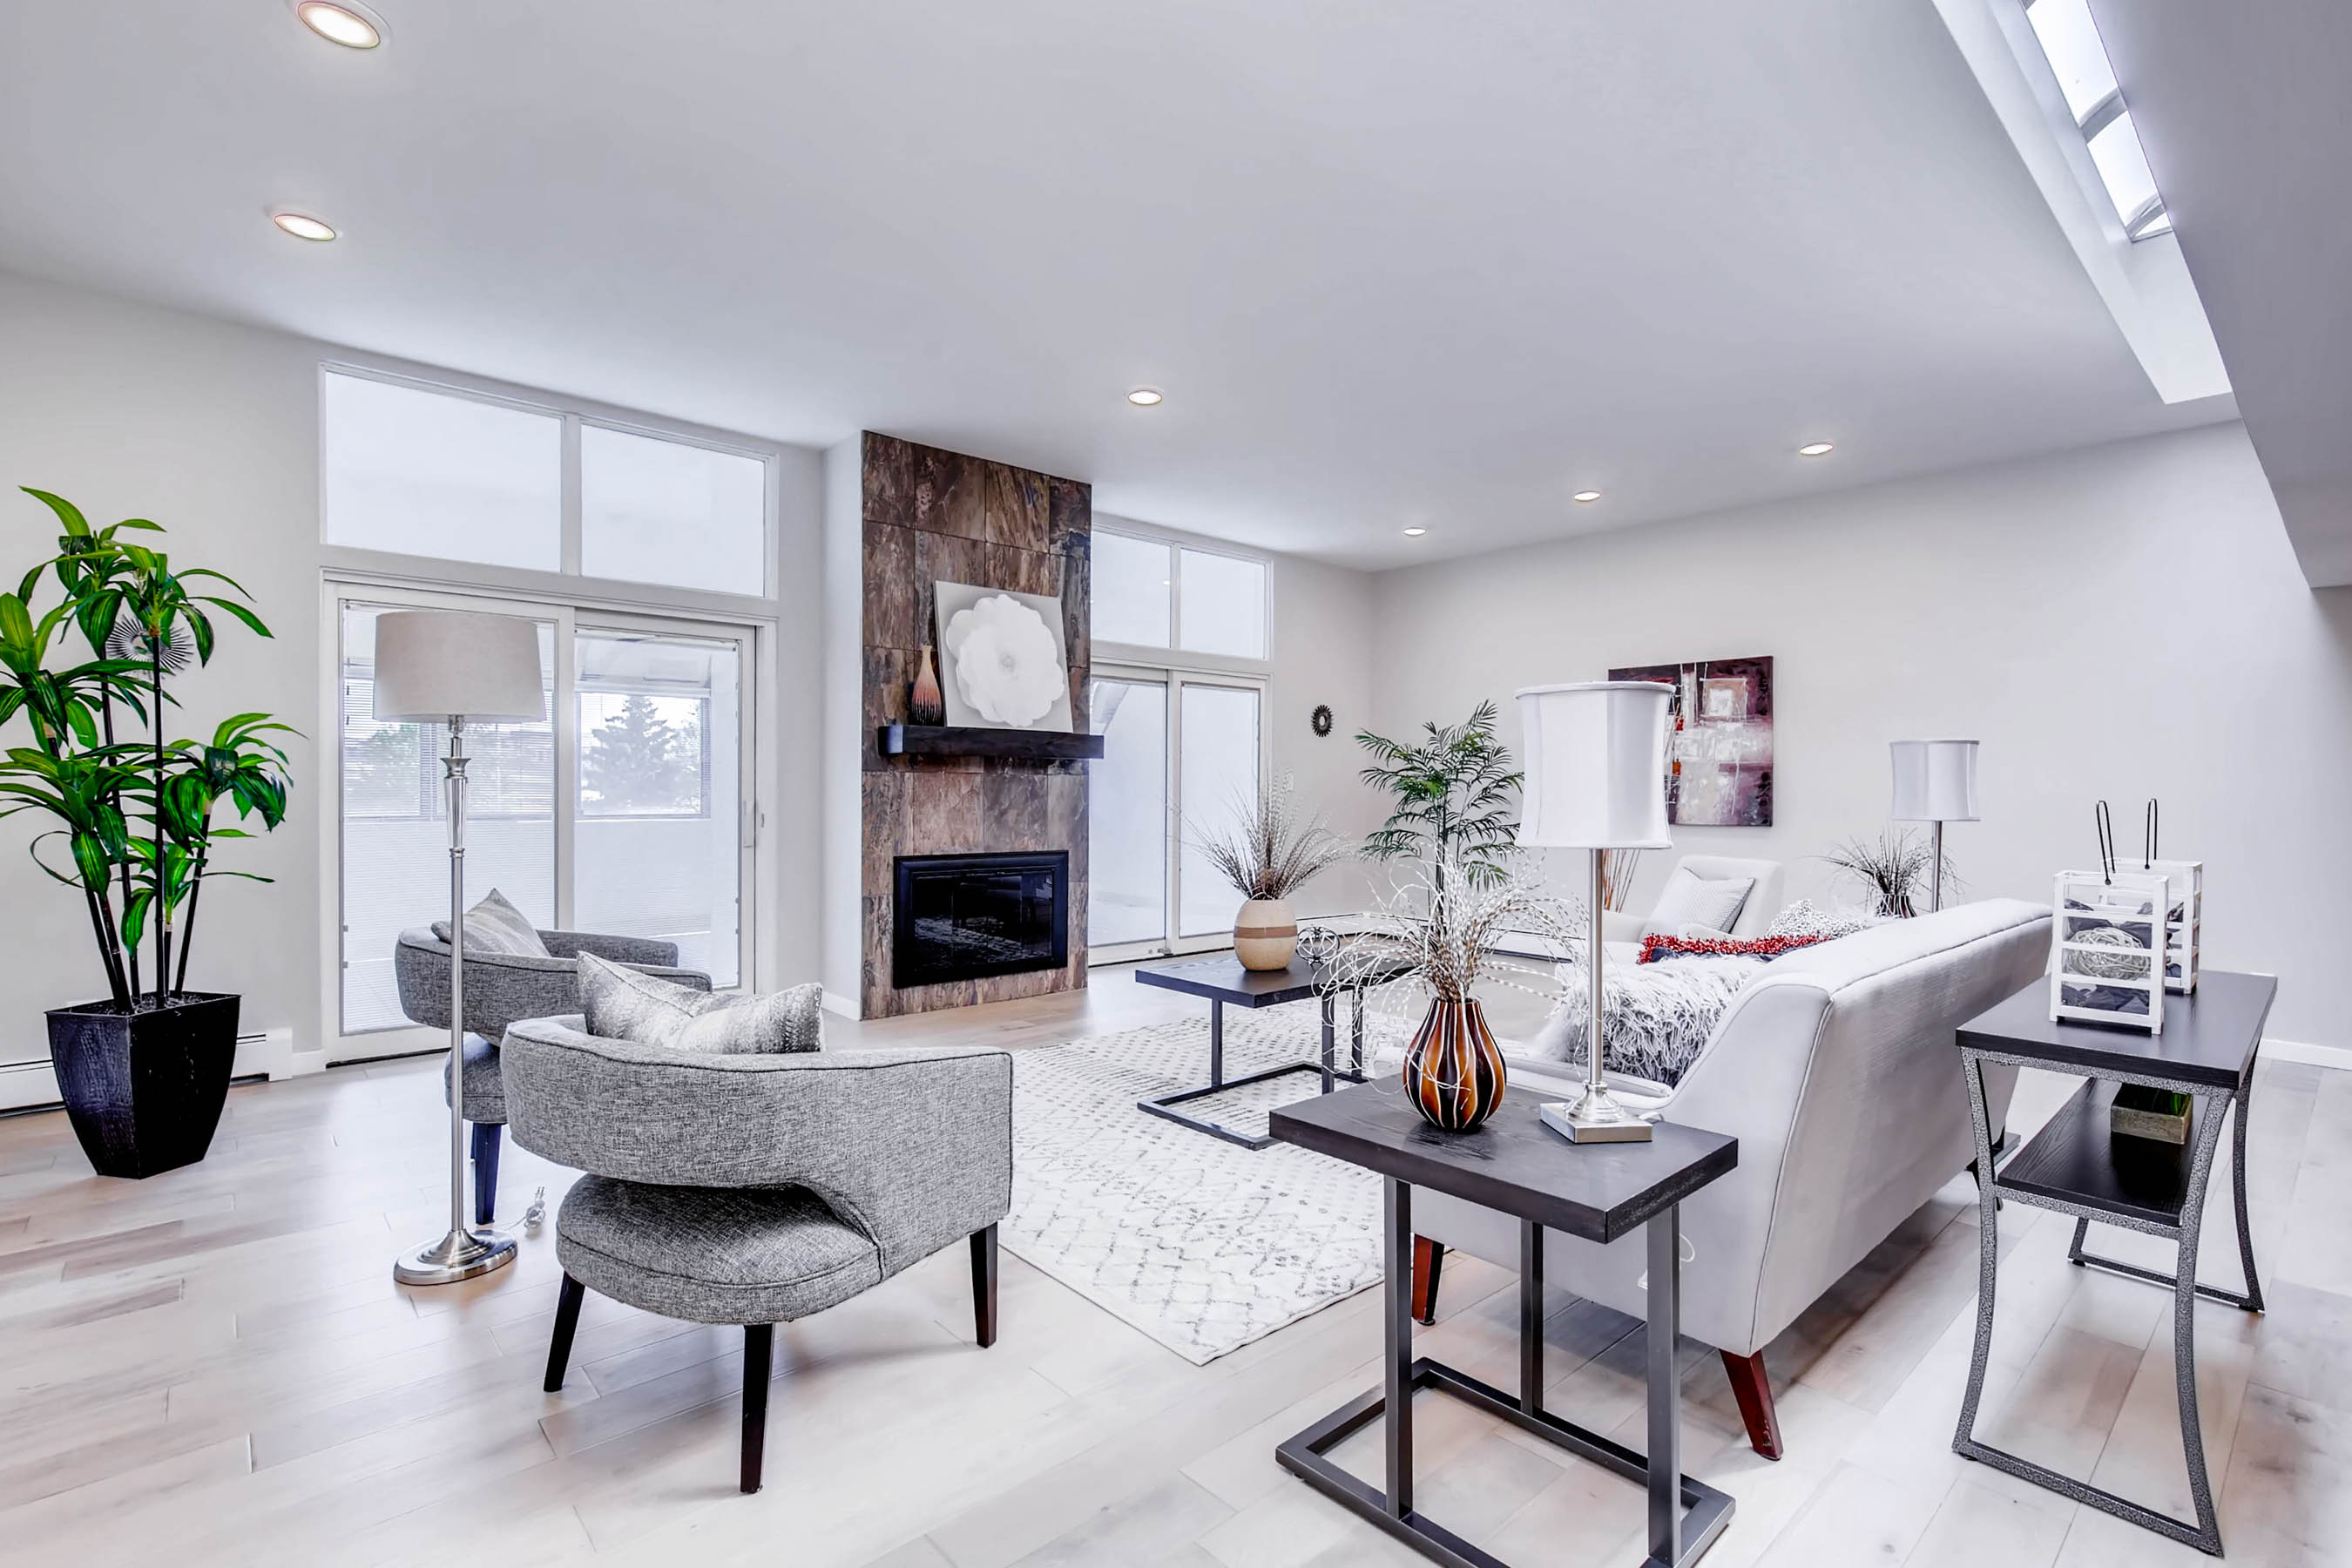 Patrick Finney Denver 2021 Real Estate